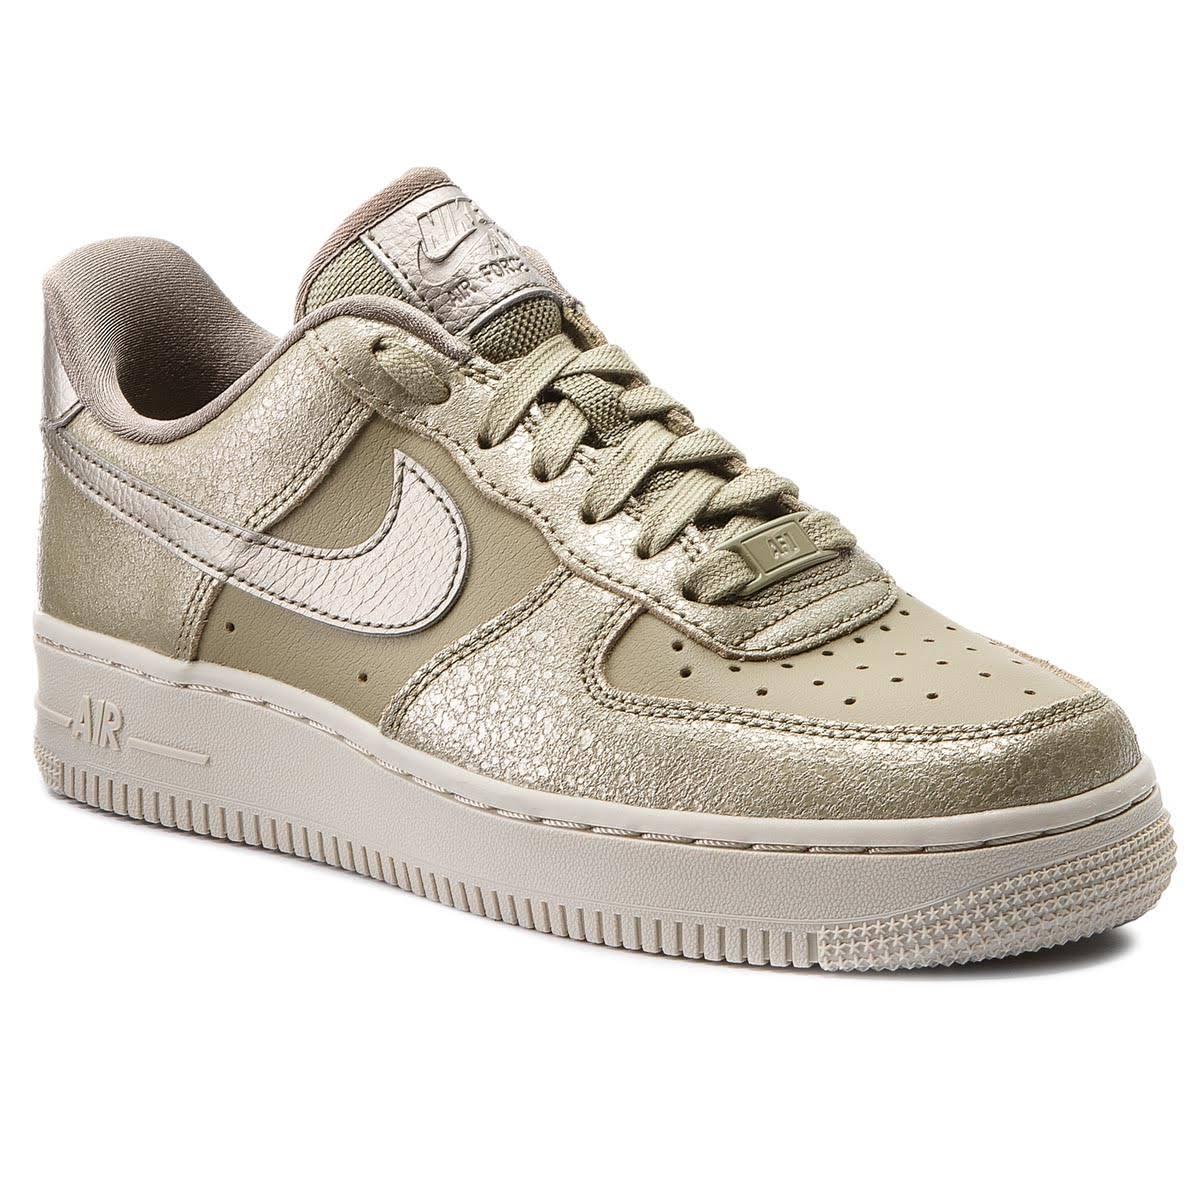 Sneaker Nike Gold Oliv Olive Neutral Schuhe Air Force '07 Olive Sportschuhe 1 Premium Beige 39 bronzed Braun Sneaker amp; Female gaOgwrq